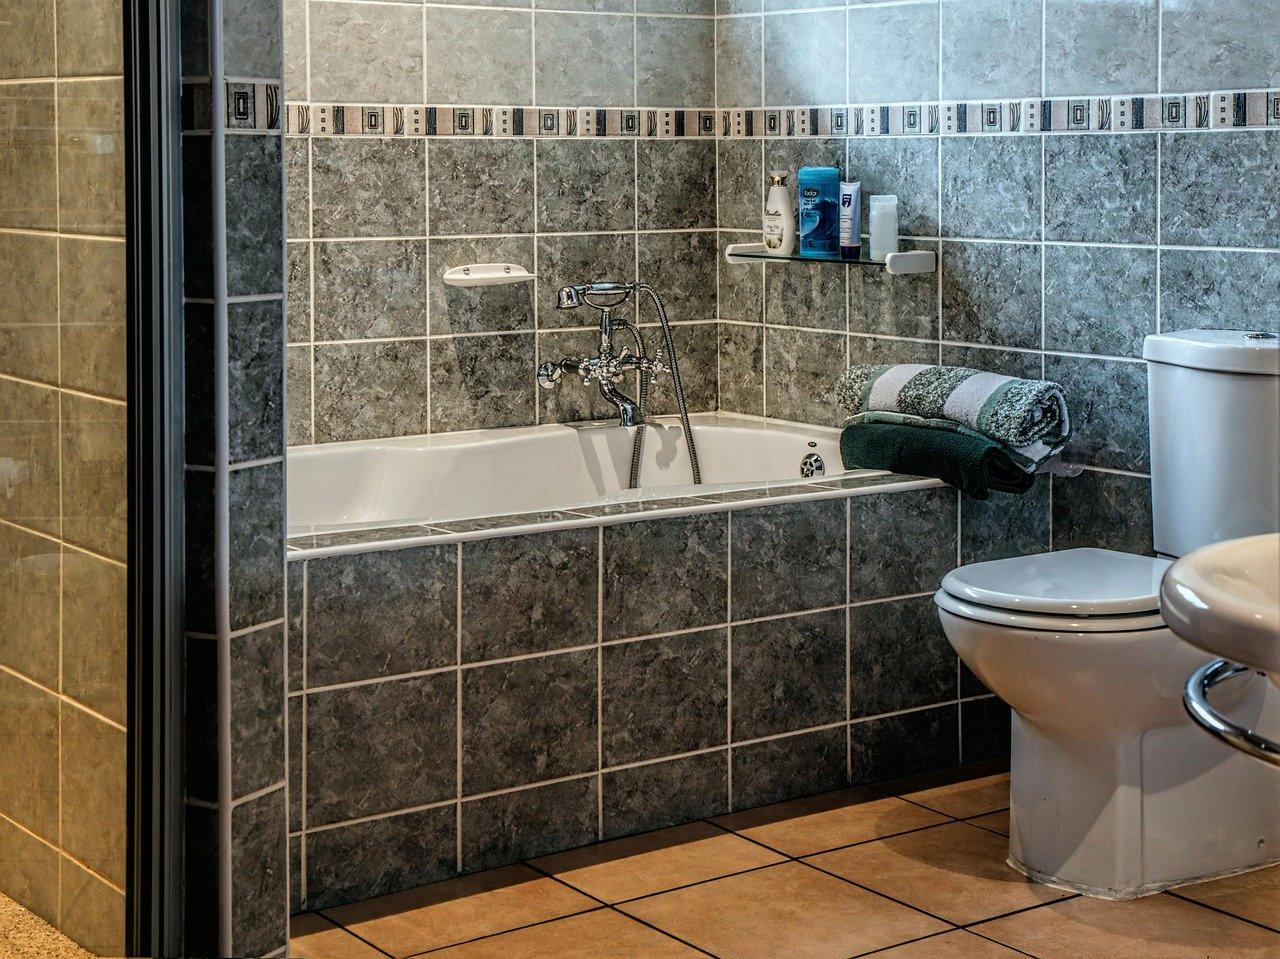 Nettoyer toilettes : 5 astuces pour nettoyer parfaitement ses toilettes